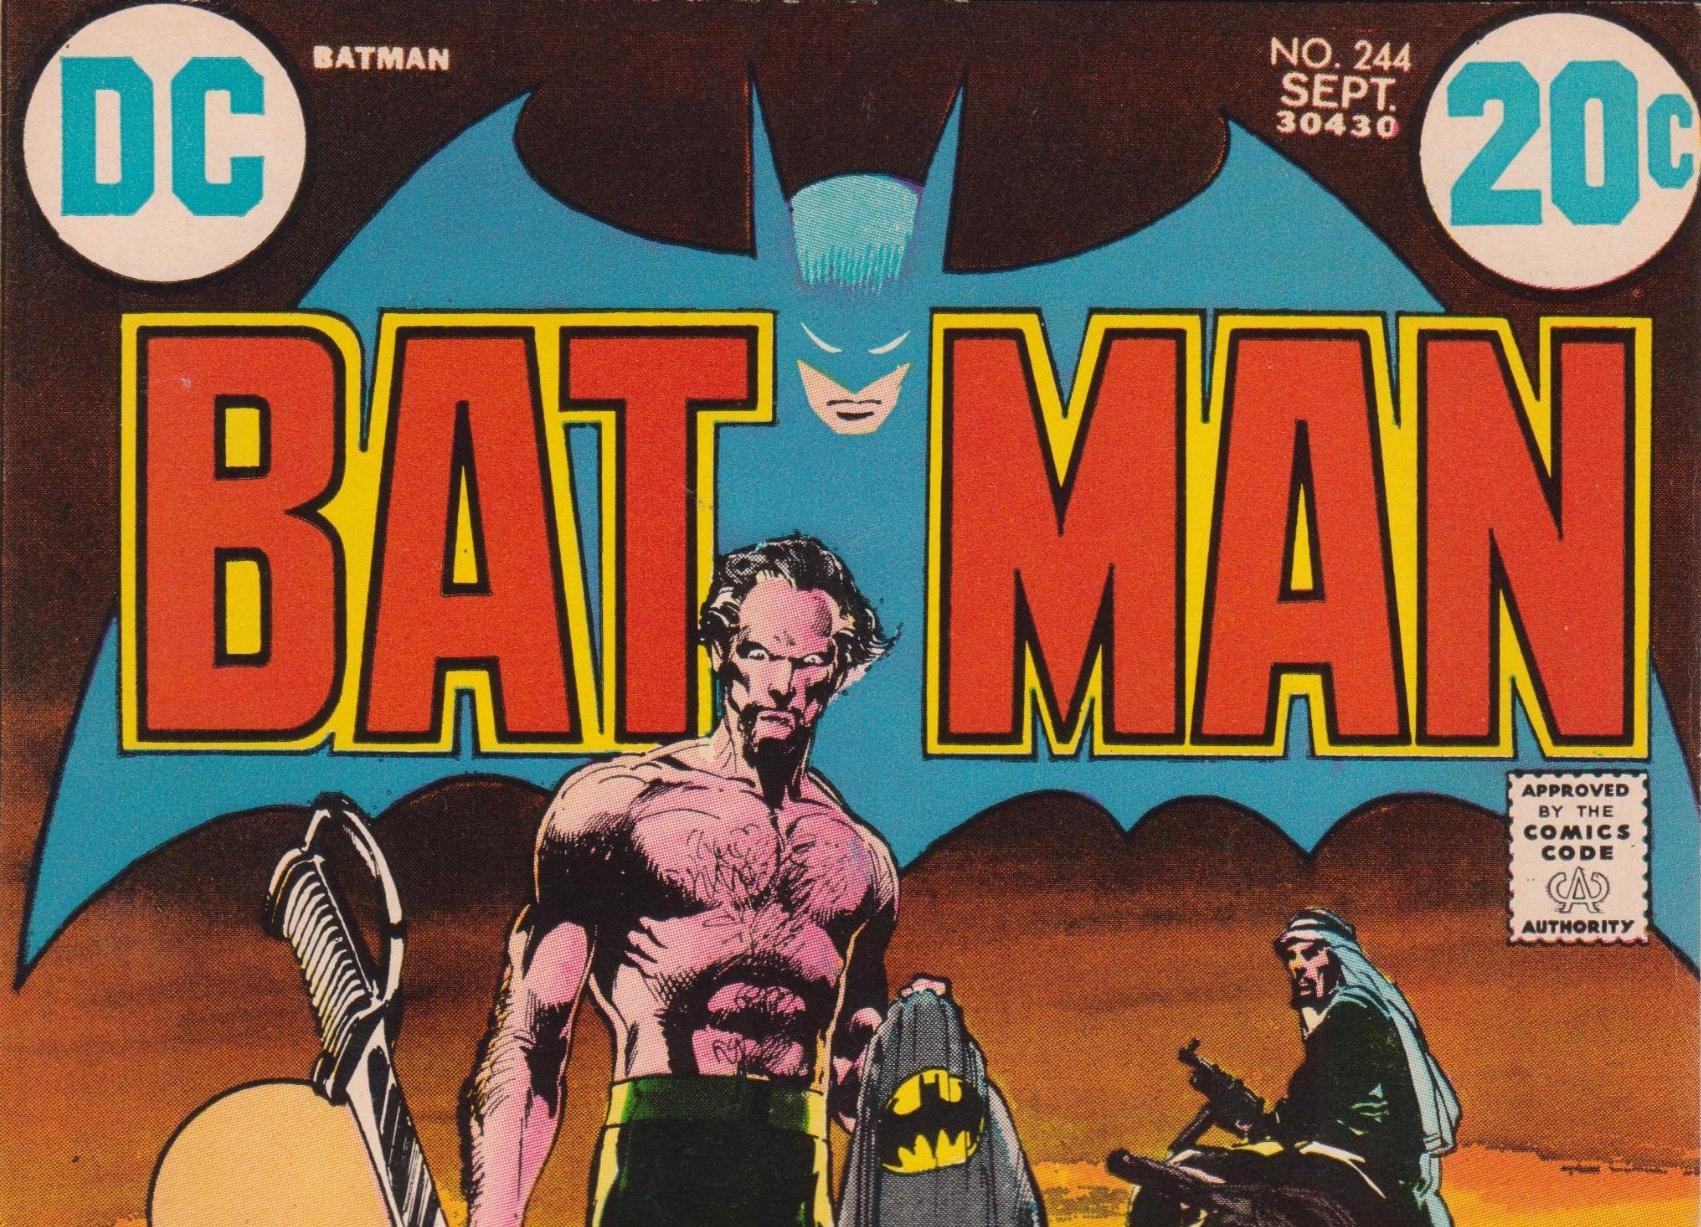 BATMAN 244 copys